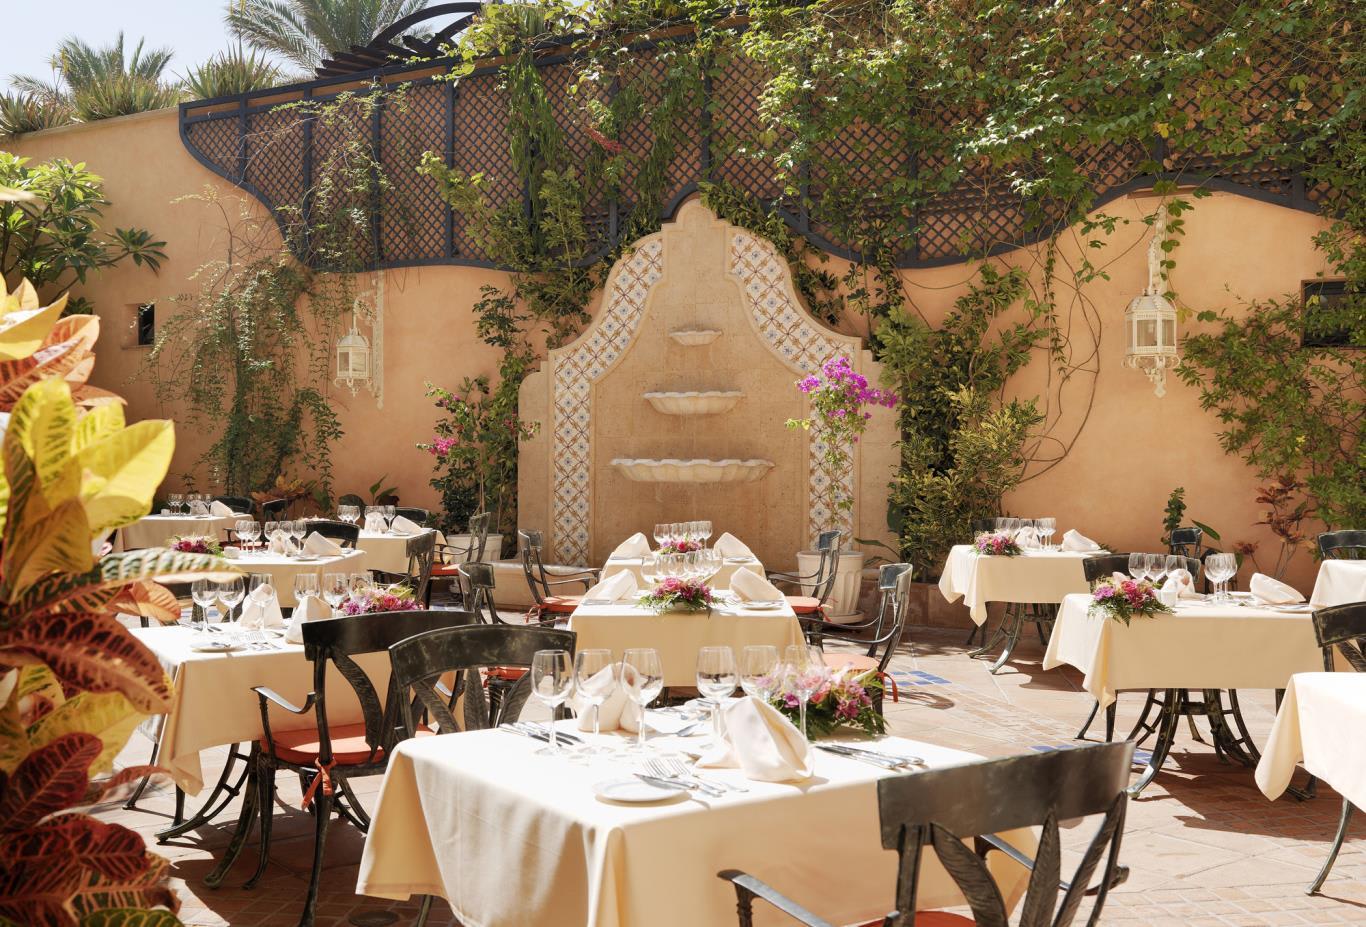 La Alacena Restaurant Patio